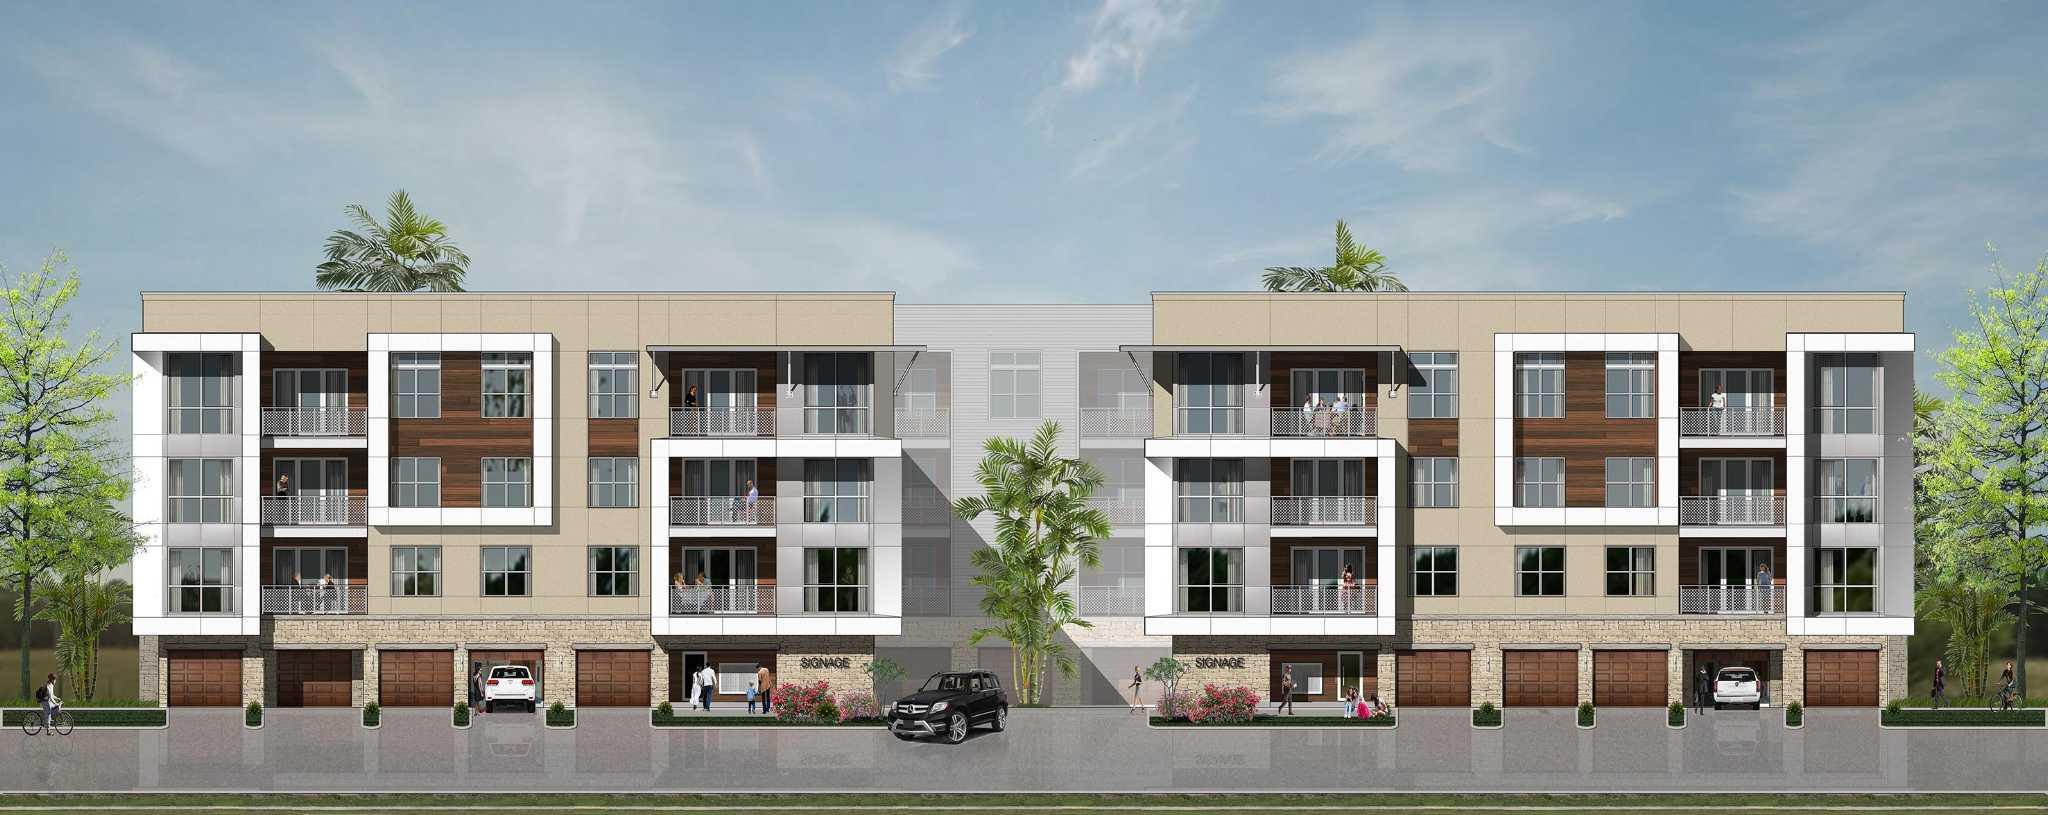 hines plans luxury apartment complex at the rim san antonio express news. Black Bedroom Furniture Sets. Home Design Ideas